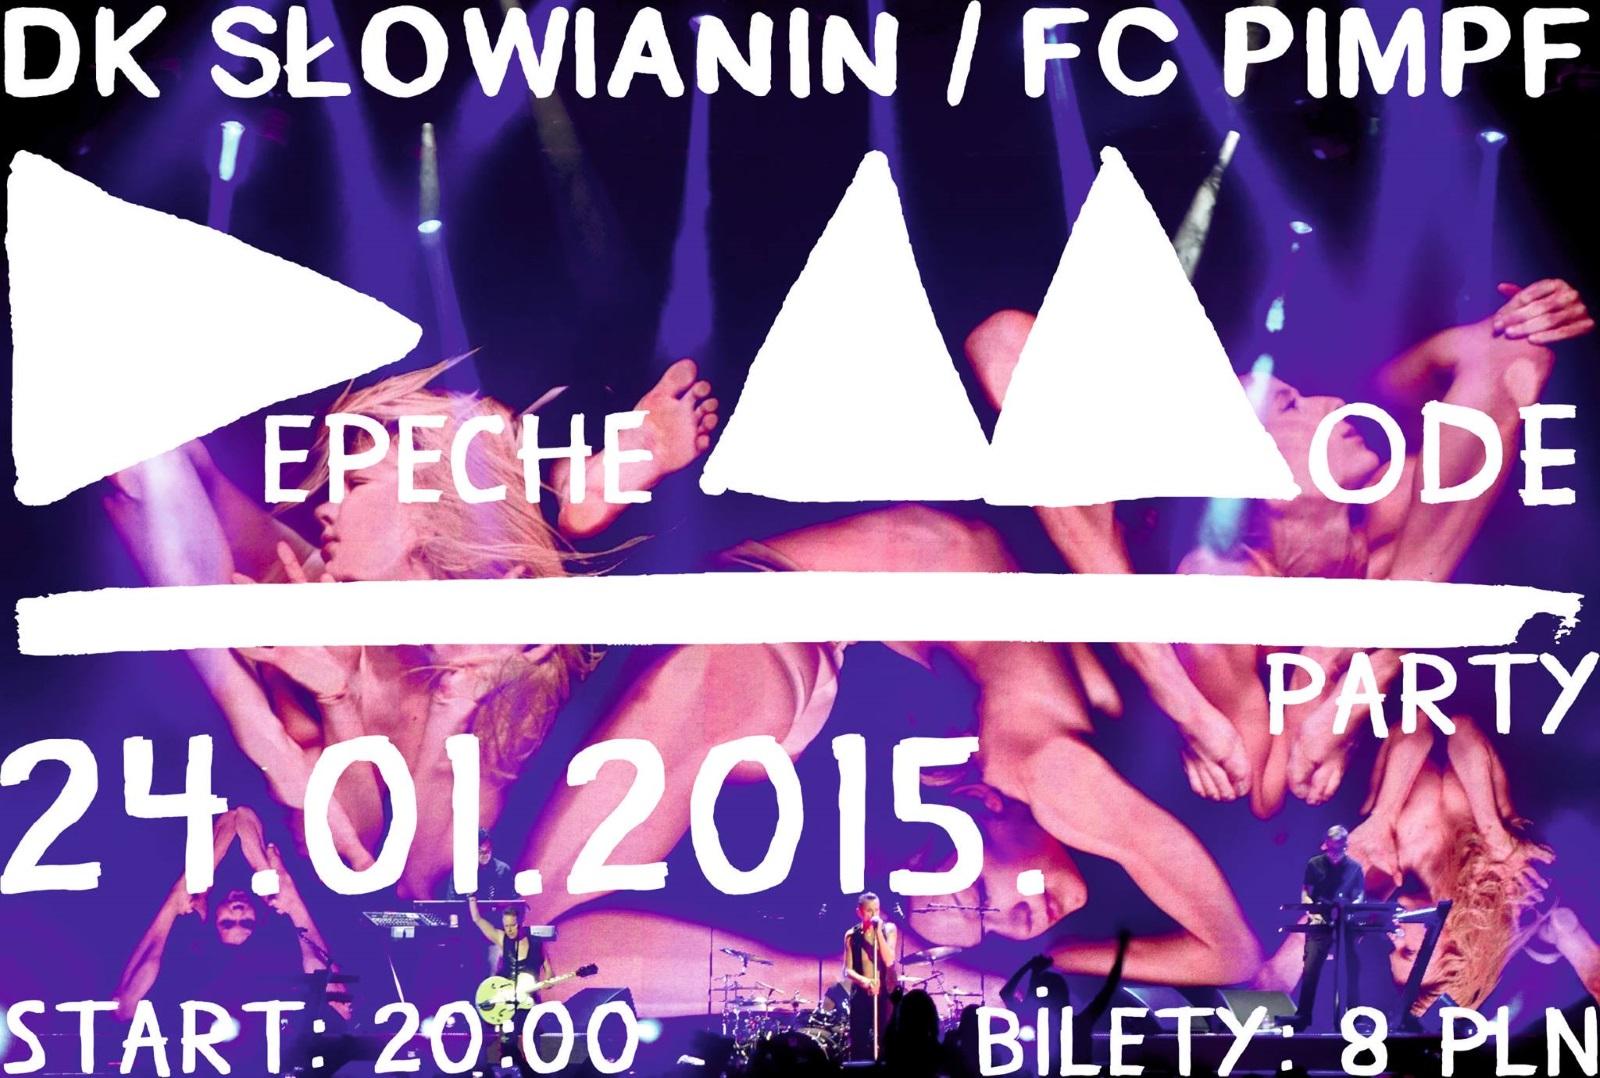 pimpf_2015_01_24